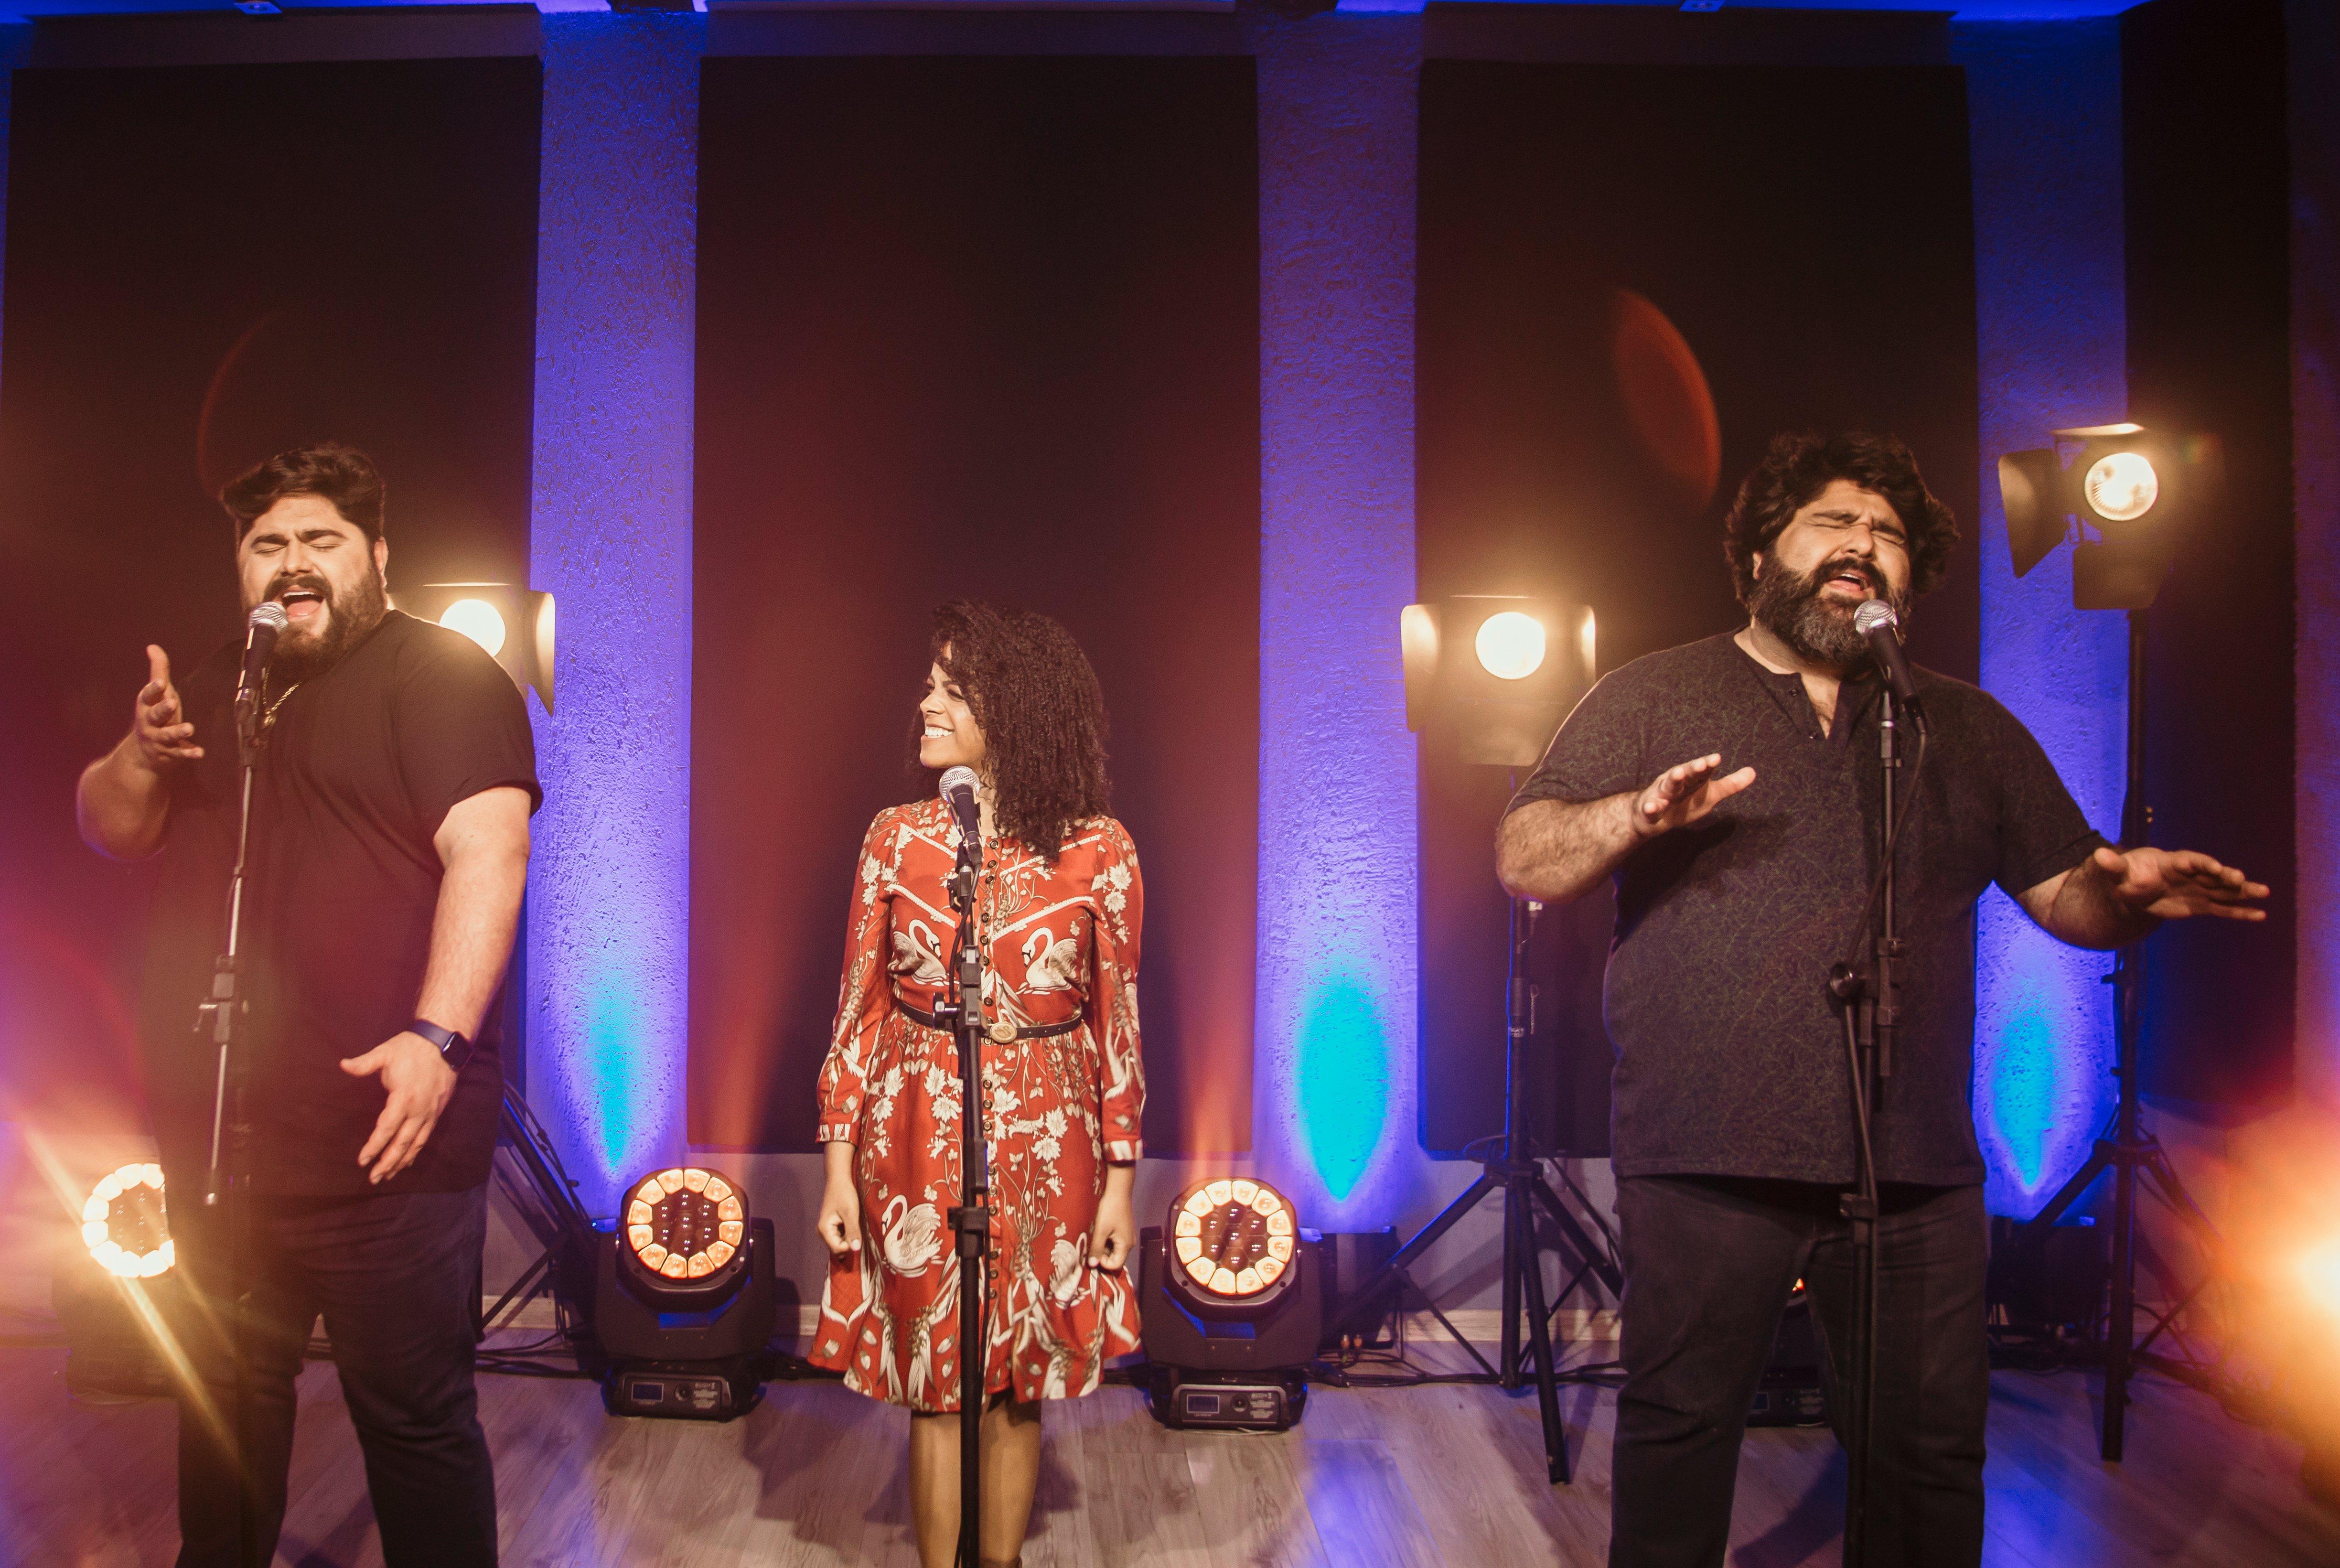 Kemilly Santos lança single com César Menotti & Fabiano